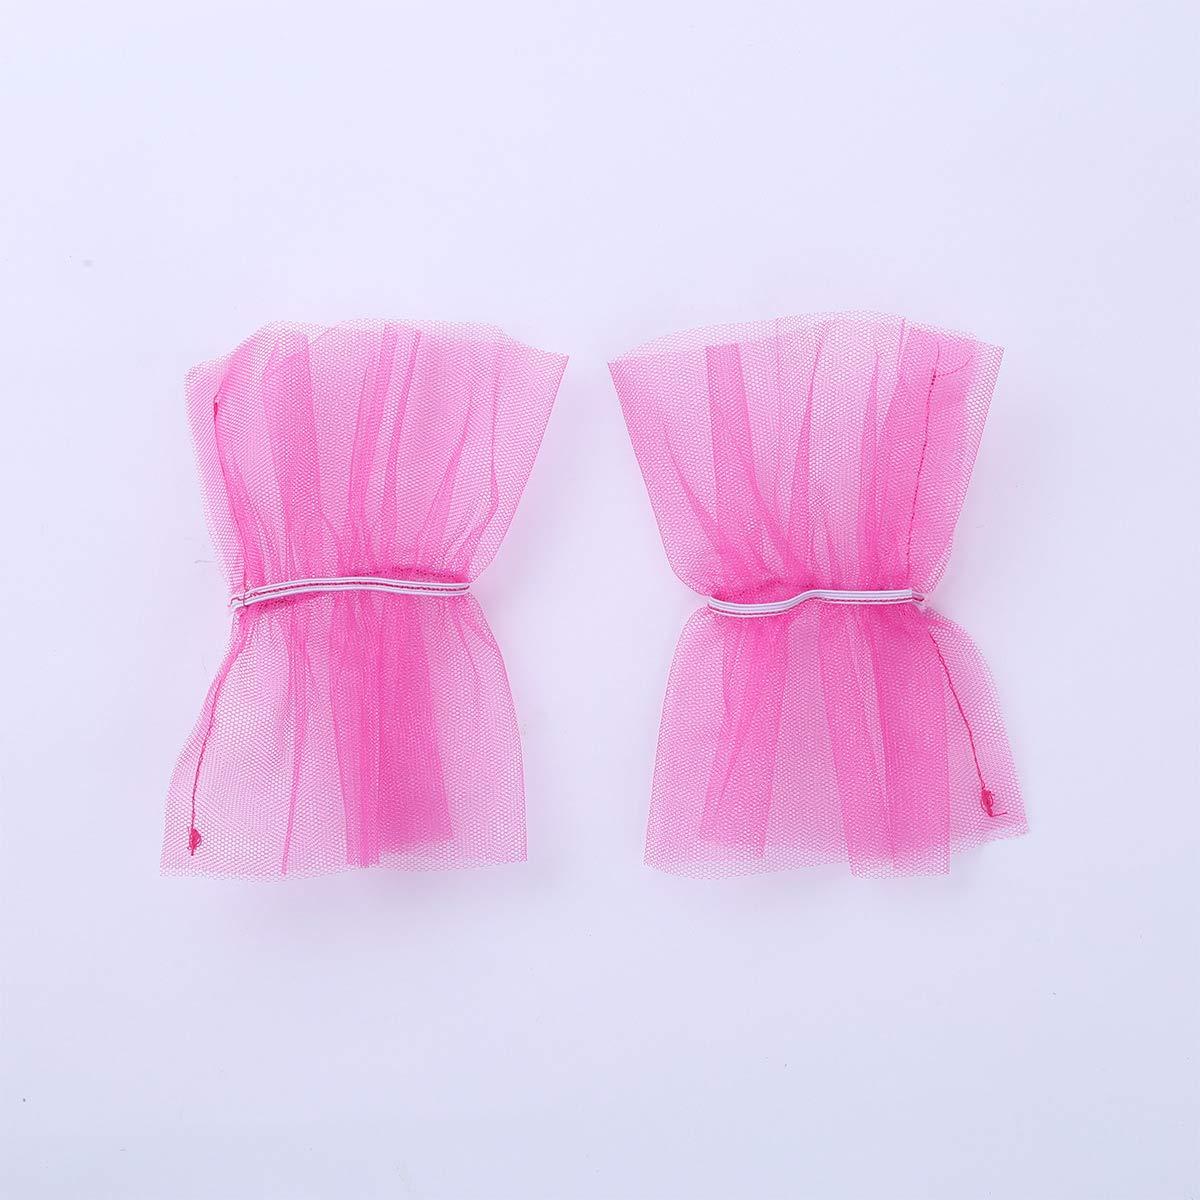 MSemis Kids Girls Shiny Sequins One-Shoulder Ballet Tutu Dress Jazz Modern Dance Stage Performance Costumes